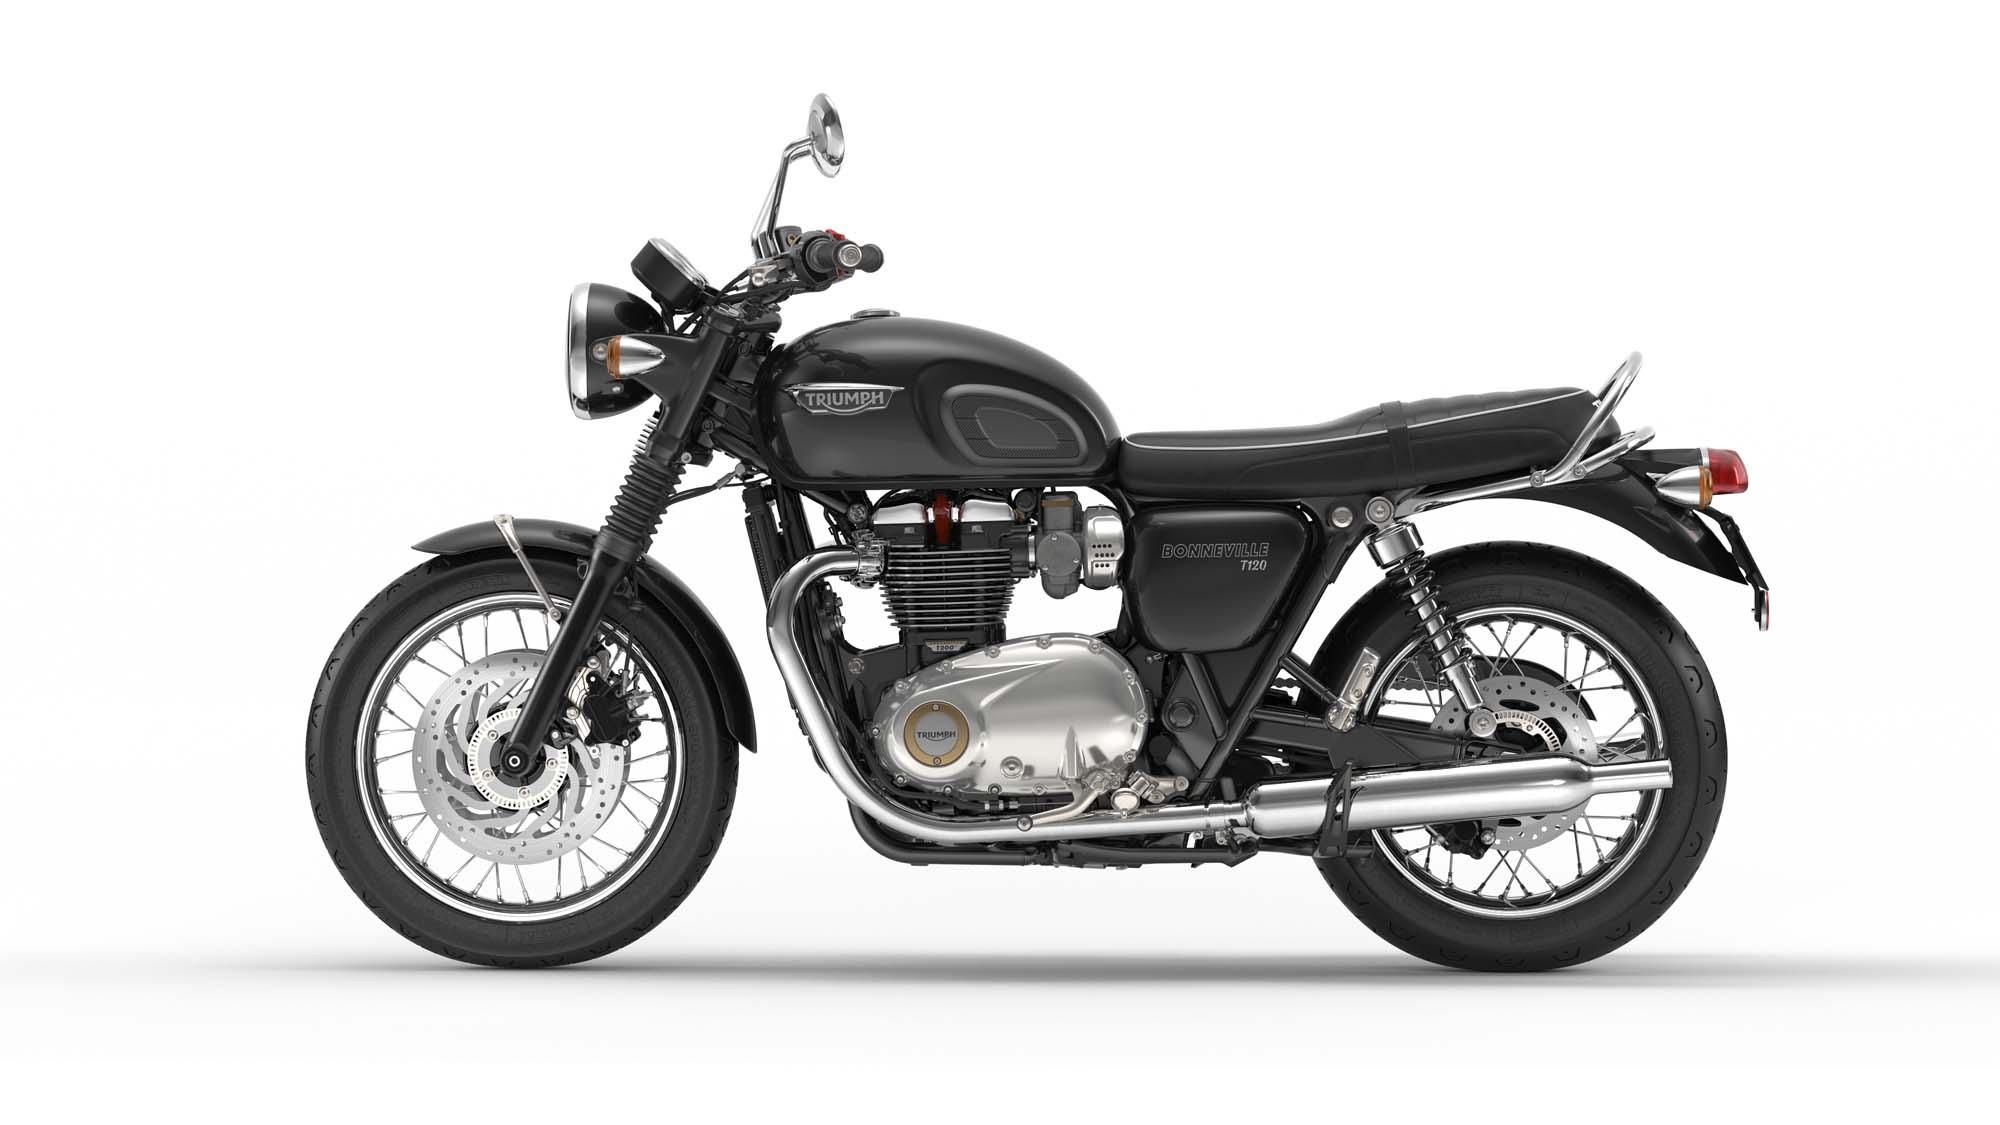 motorrad occasion triumph bonneville t120 kaufen. Black Bedroom Furniture Sets. Home Design Ideas